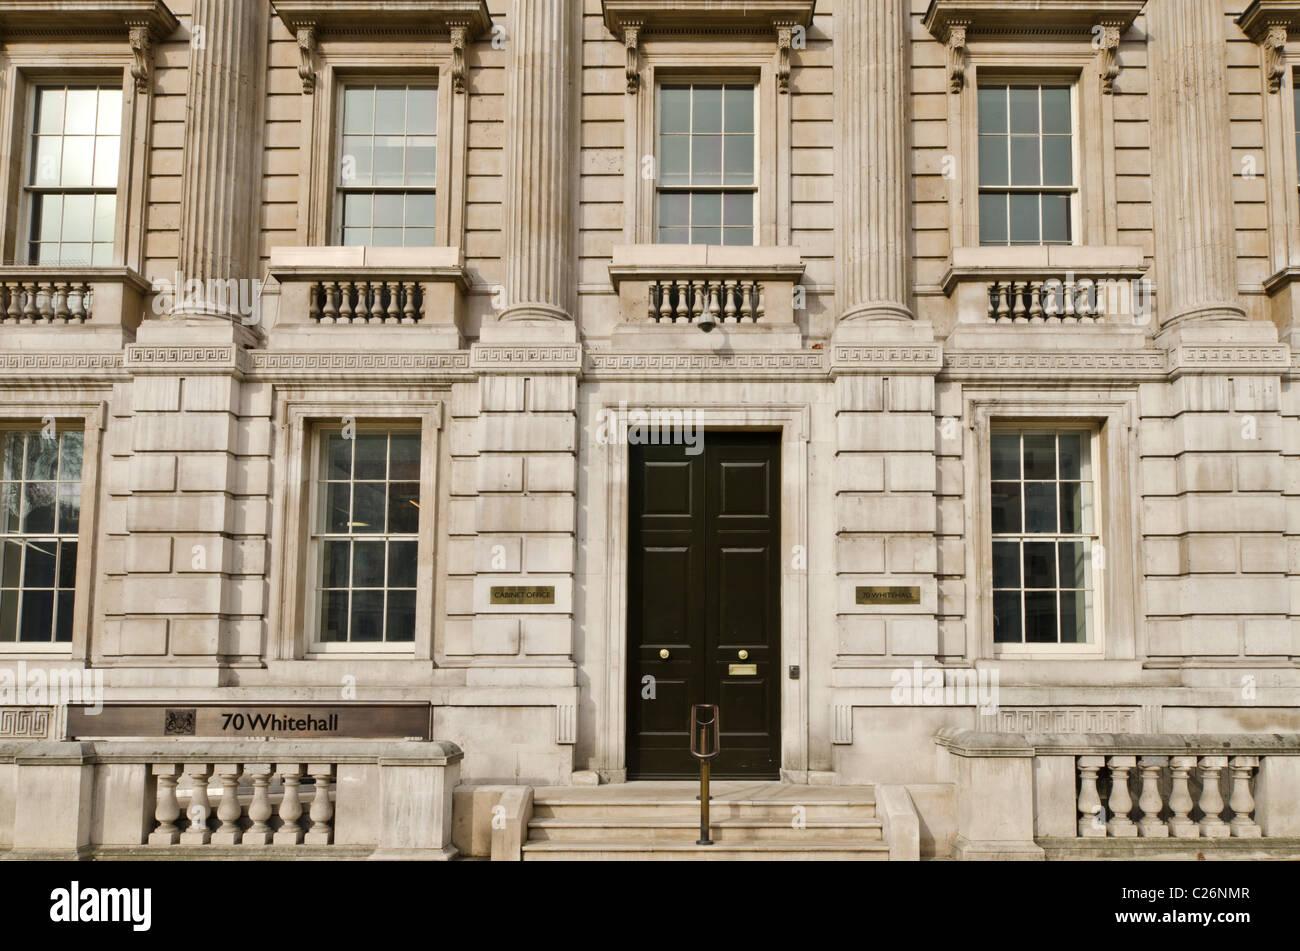 the cabinet office entrance 70 whitehall, london uk stock photo